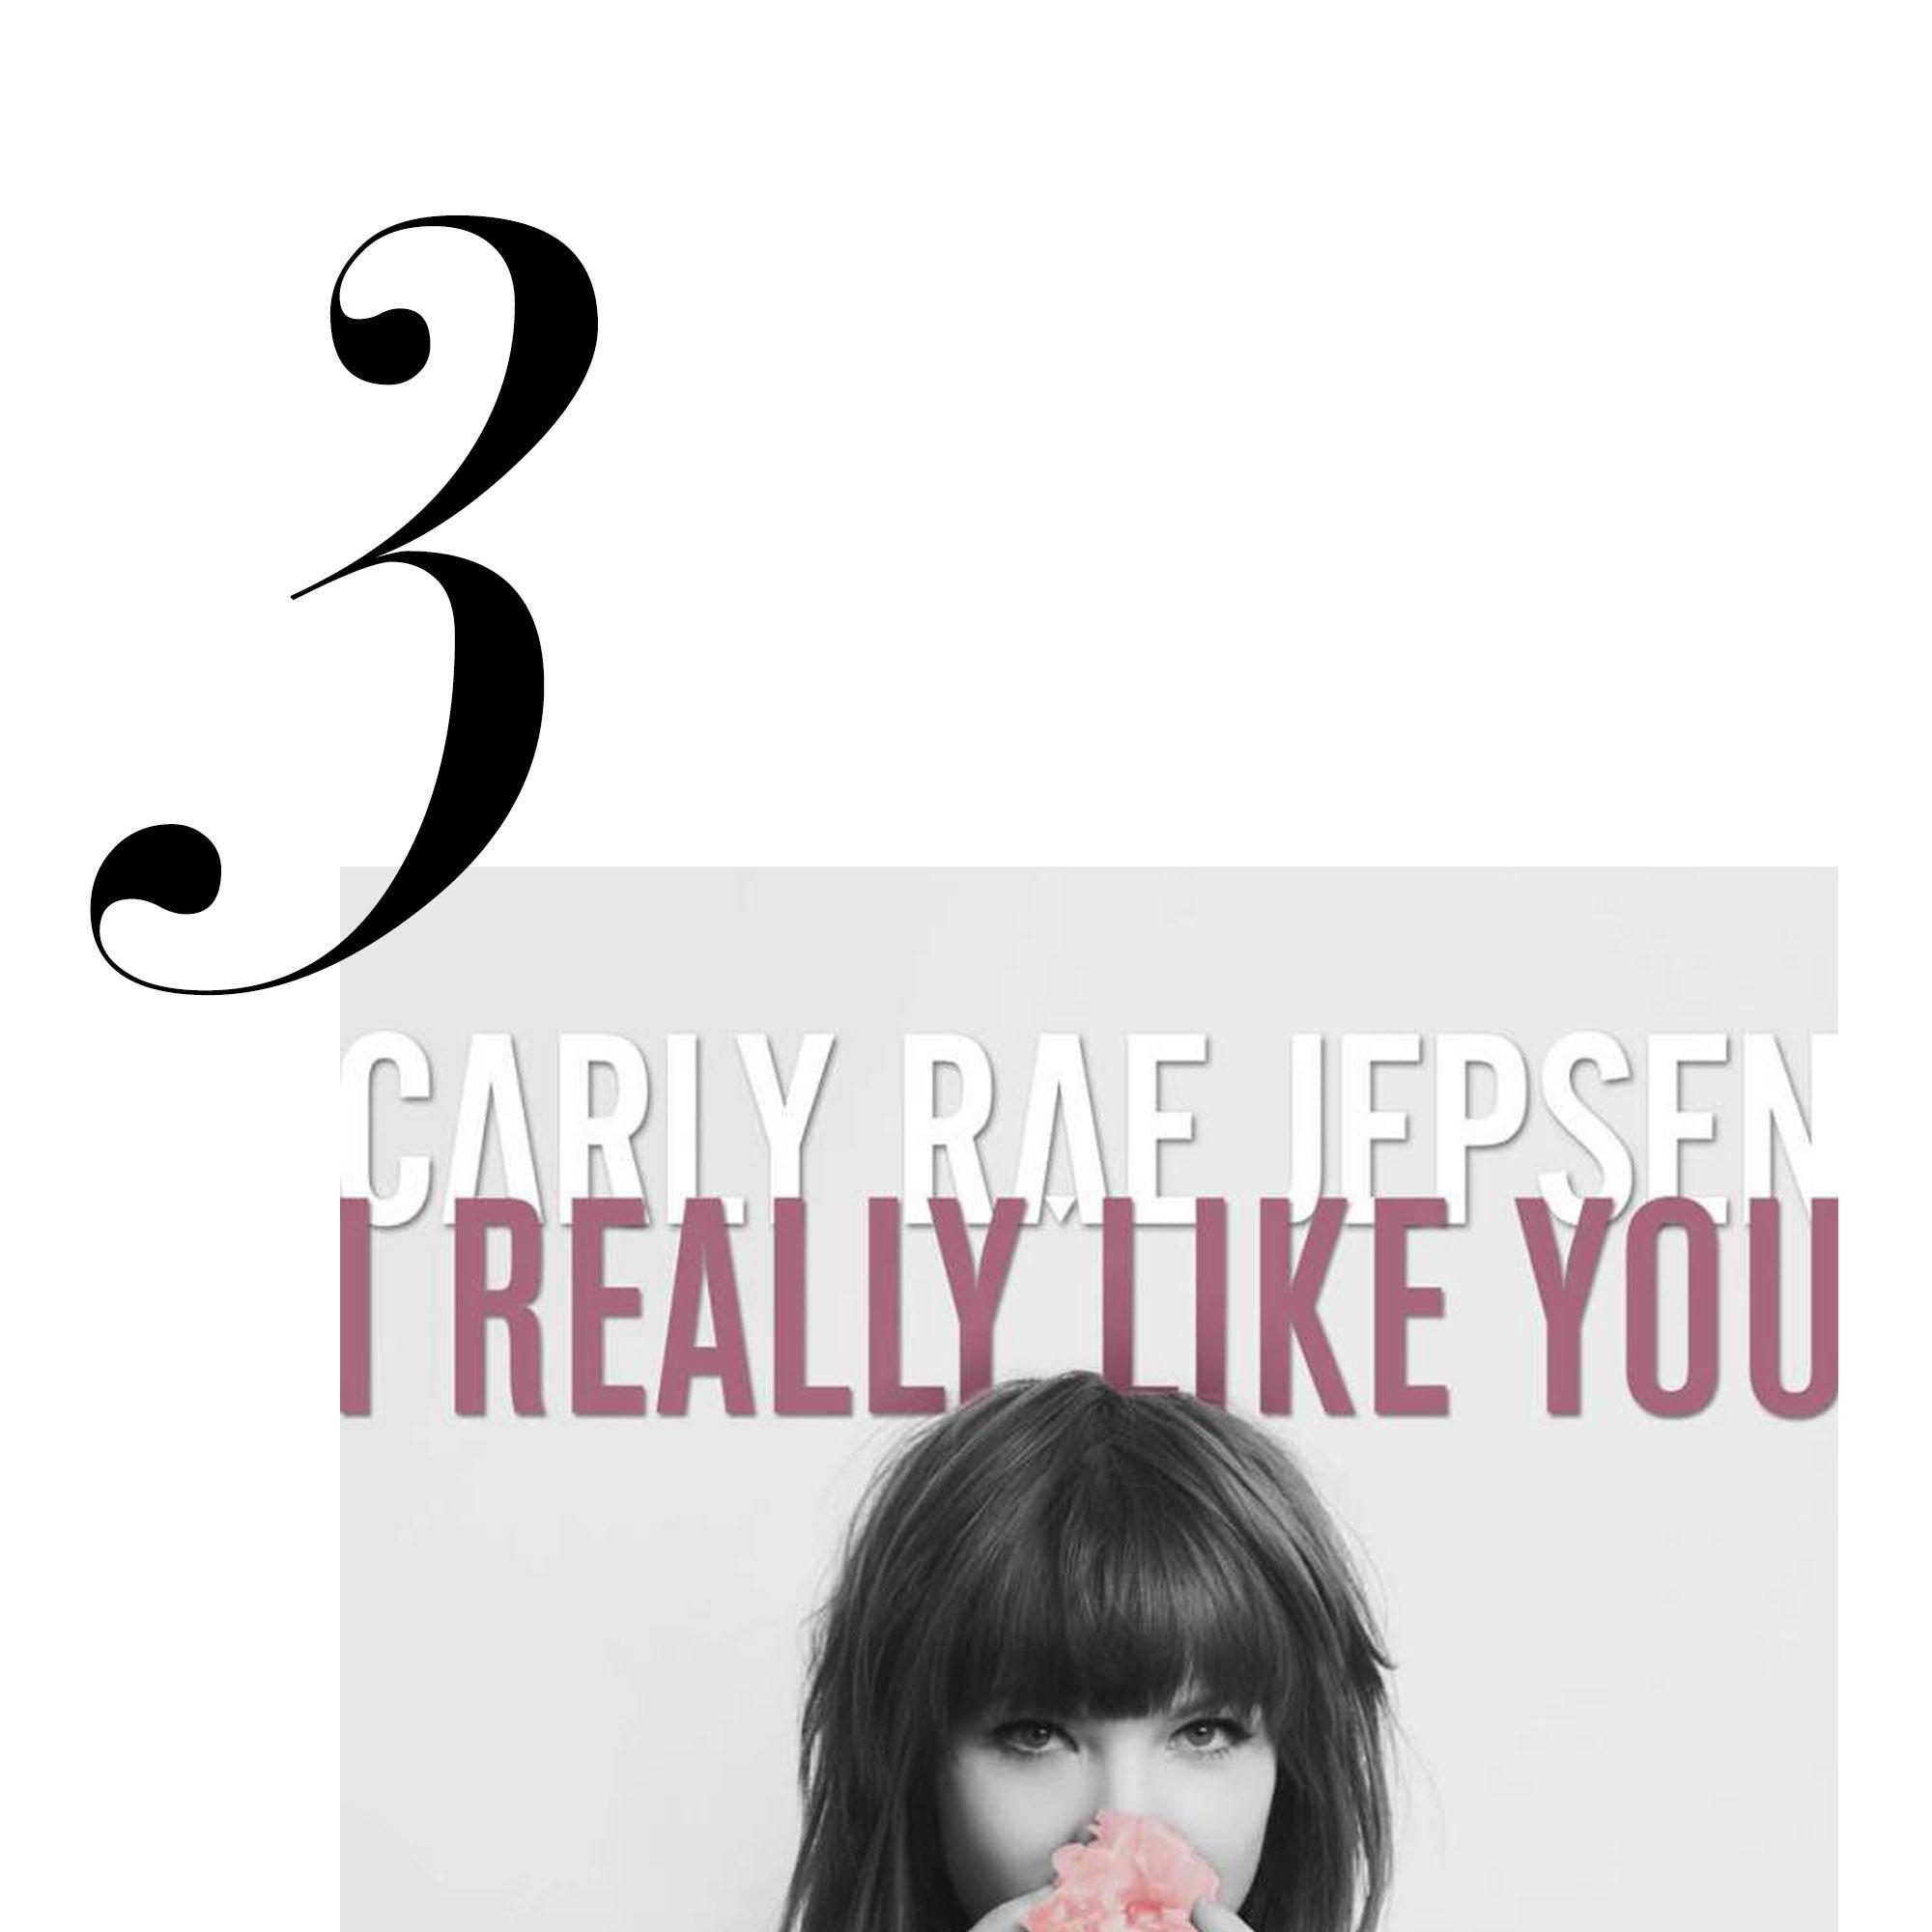 """I Really Like You""<a href=""http://open.spotify.com/track/3O09PoBmmhotSUxLZfcRP0"">Listen here</a>.&nbsp&#x3B;"